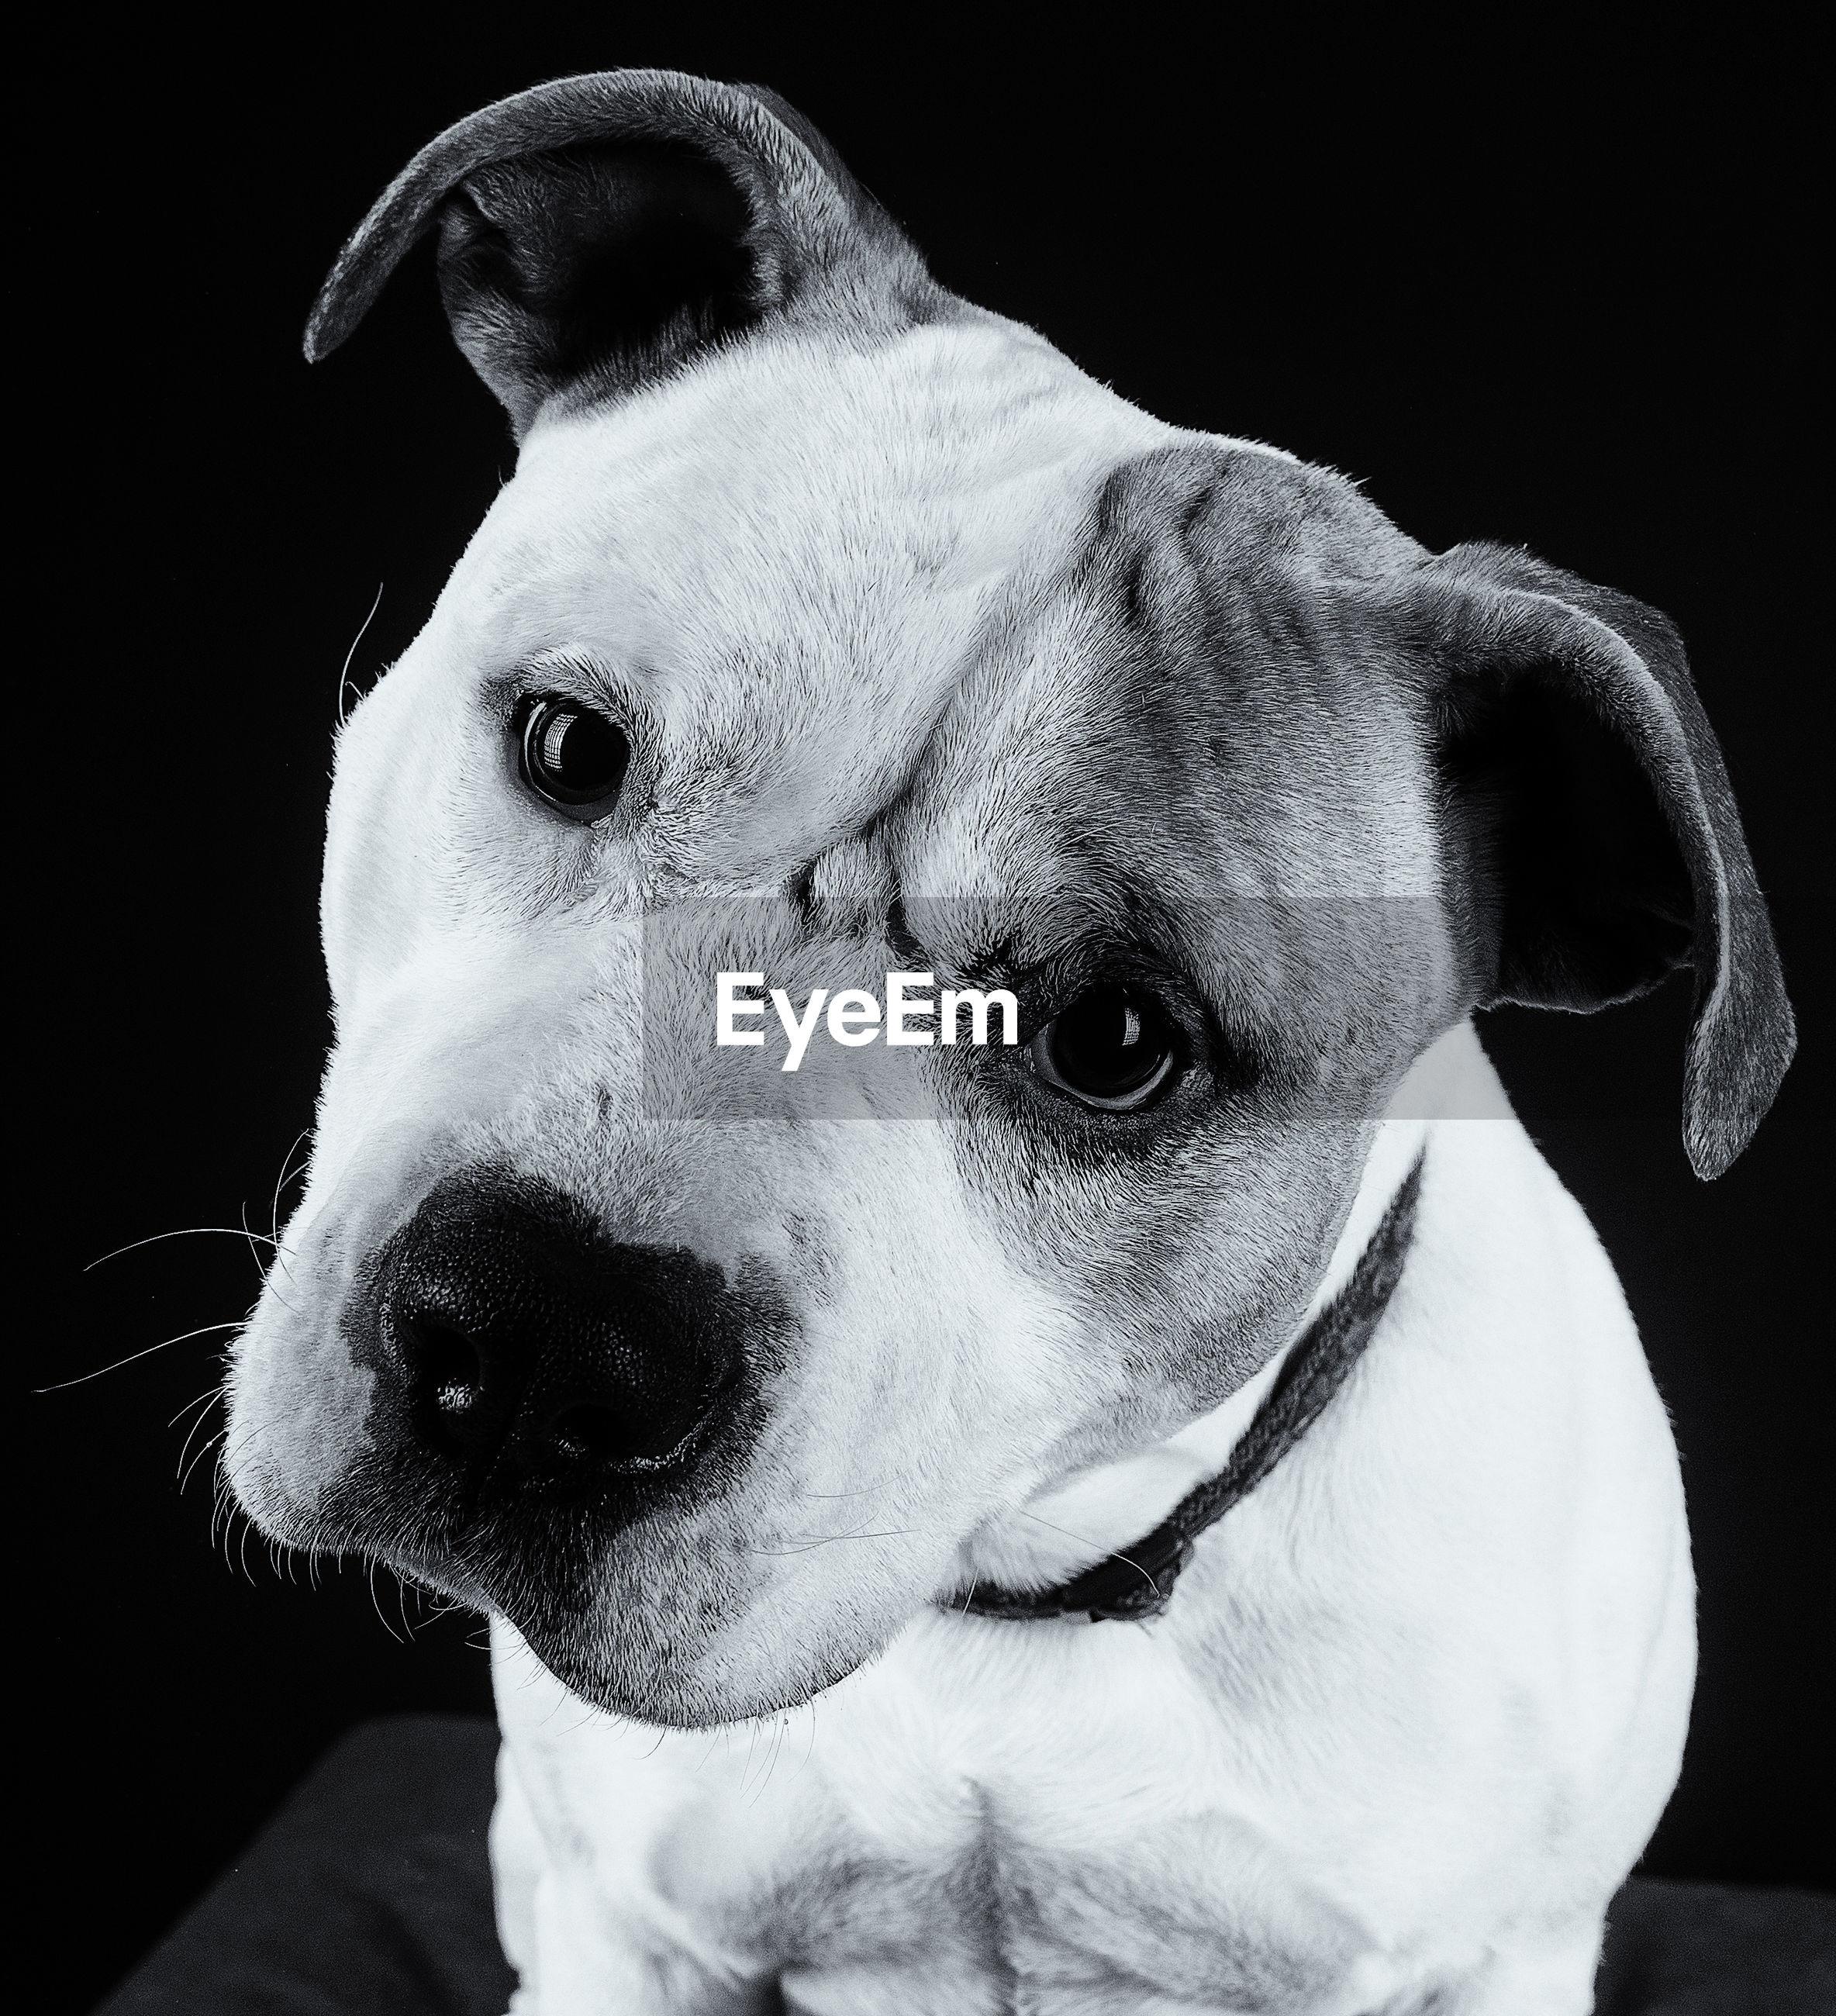 CLOSE-UP PORTRAIT OF DOG AGAINST BLACK